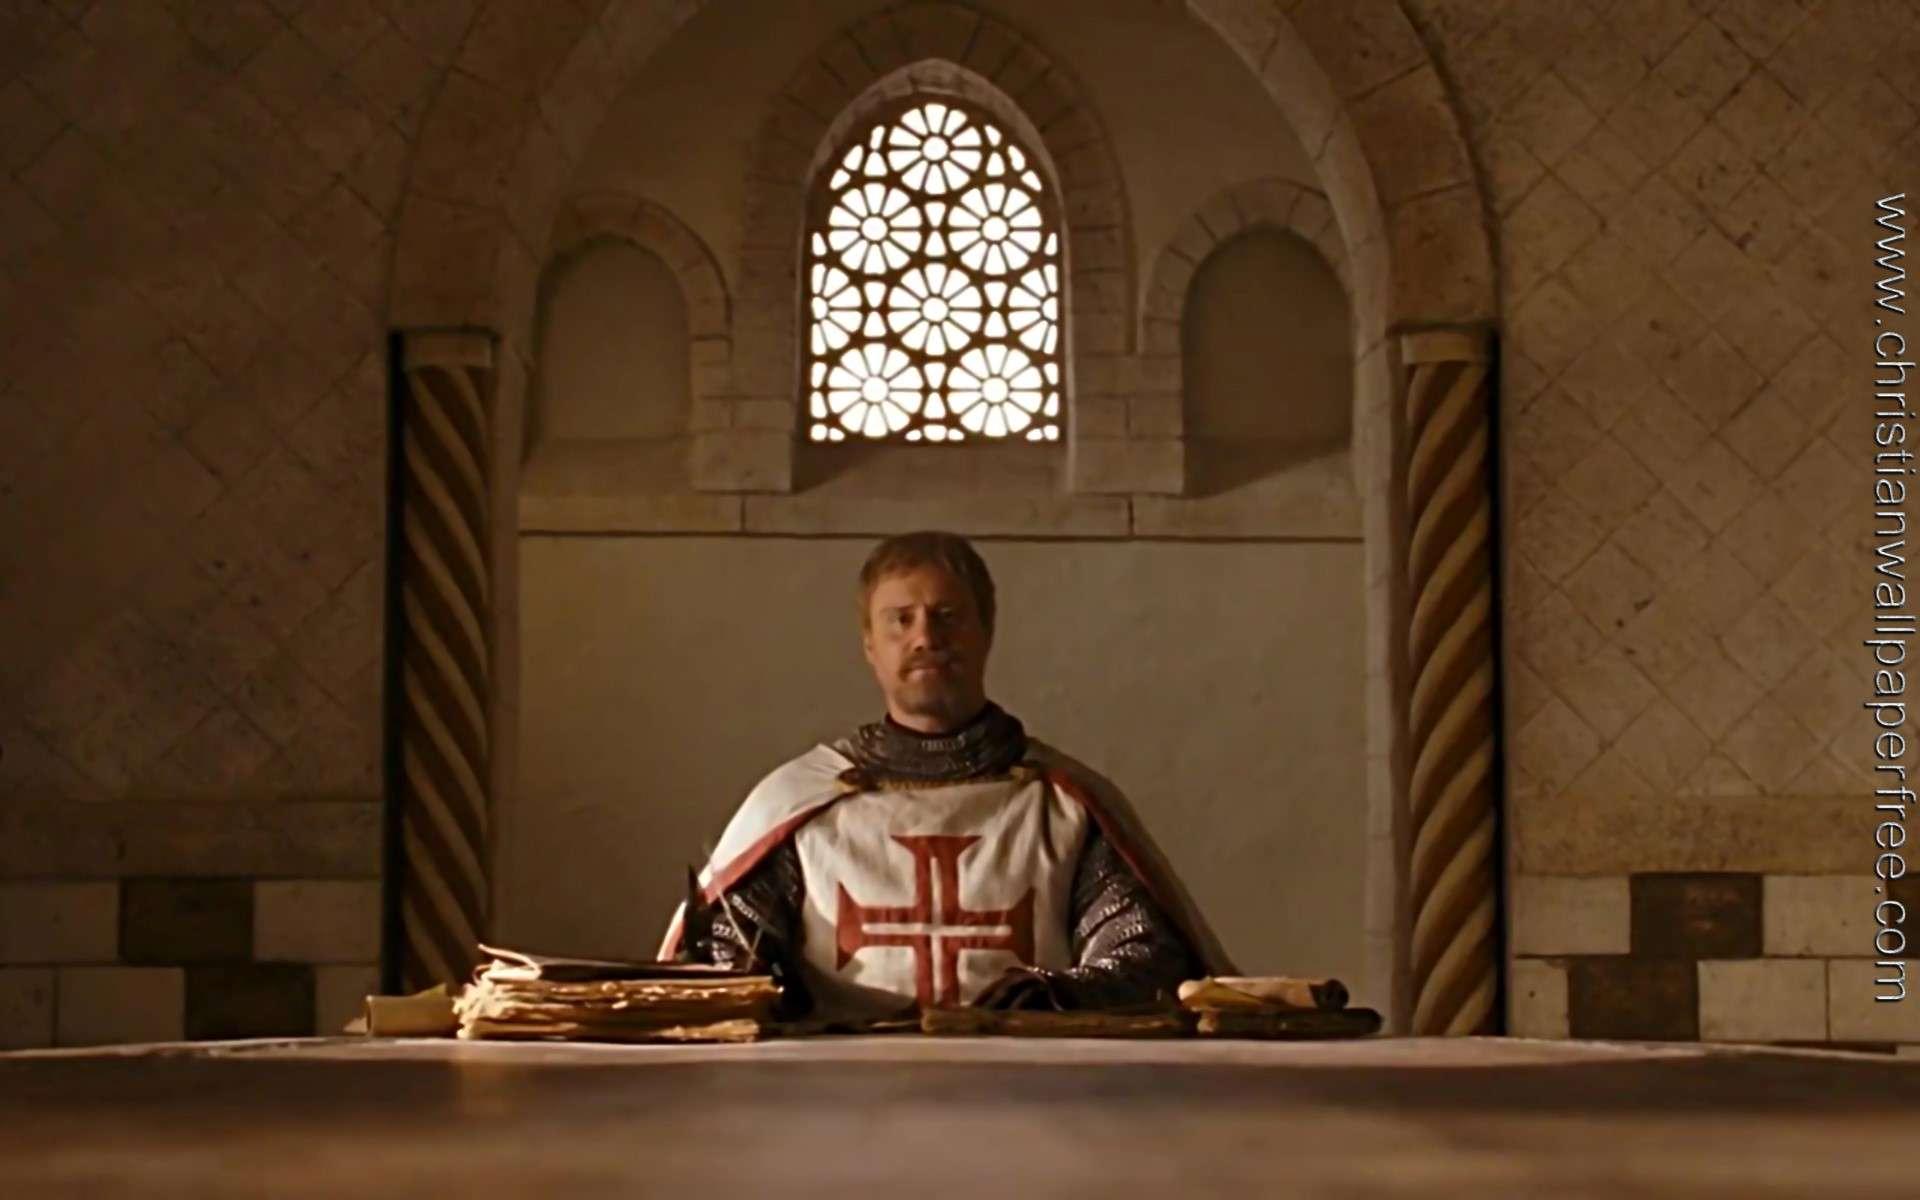 Arn the Knight Templar Torroja 01